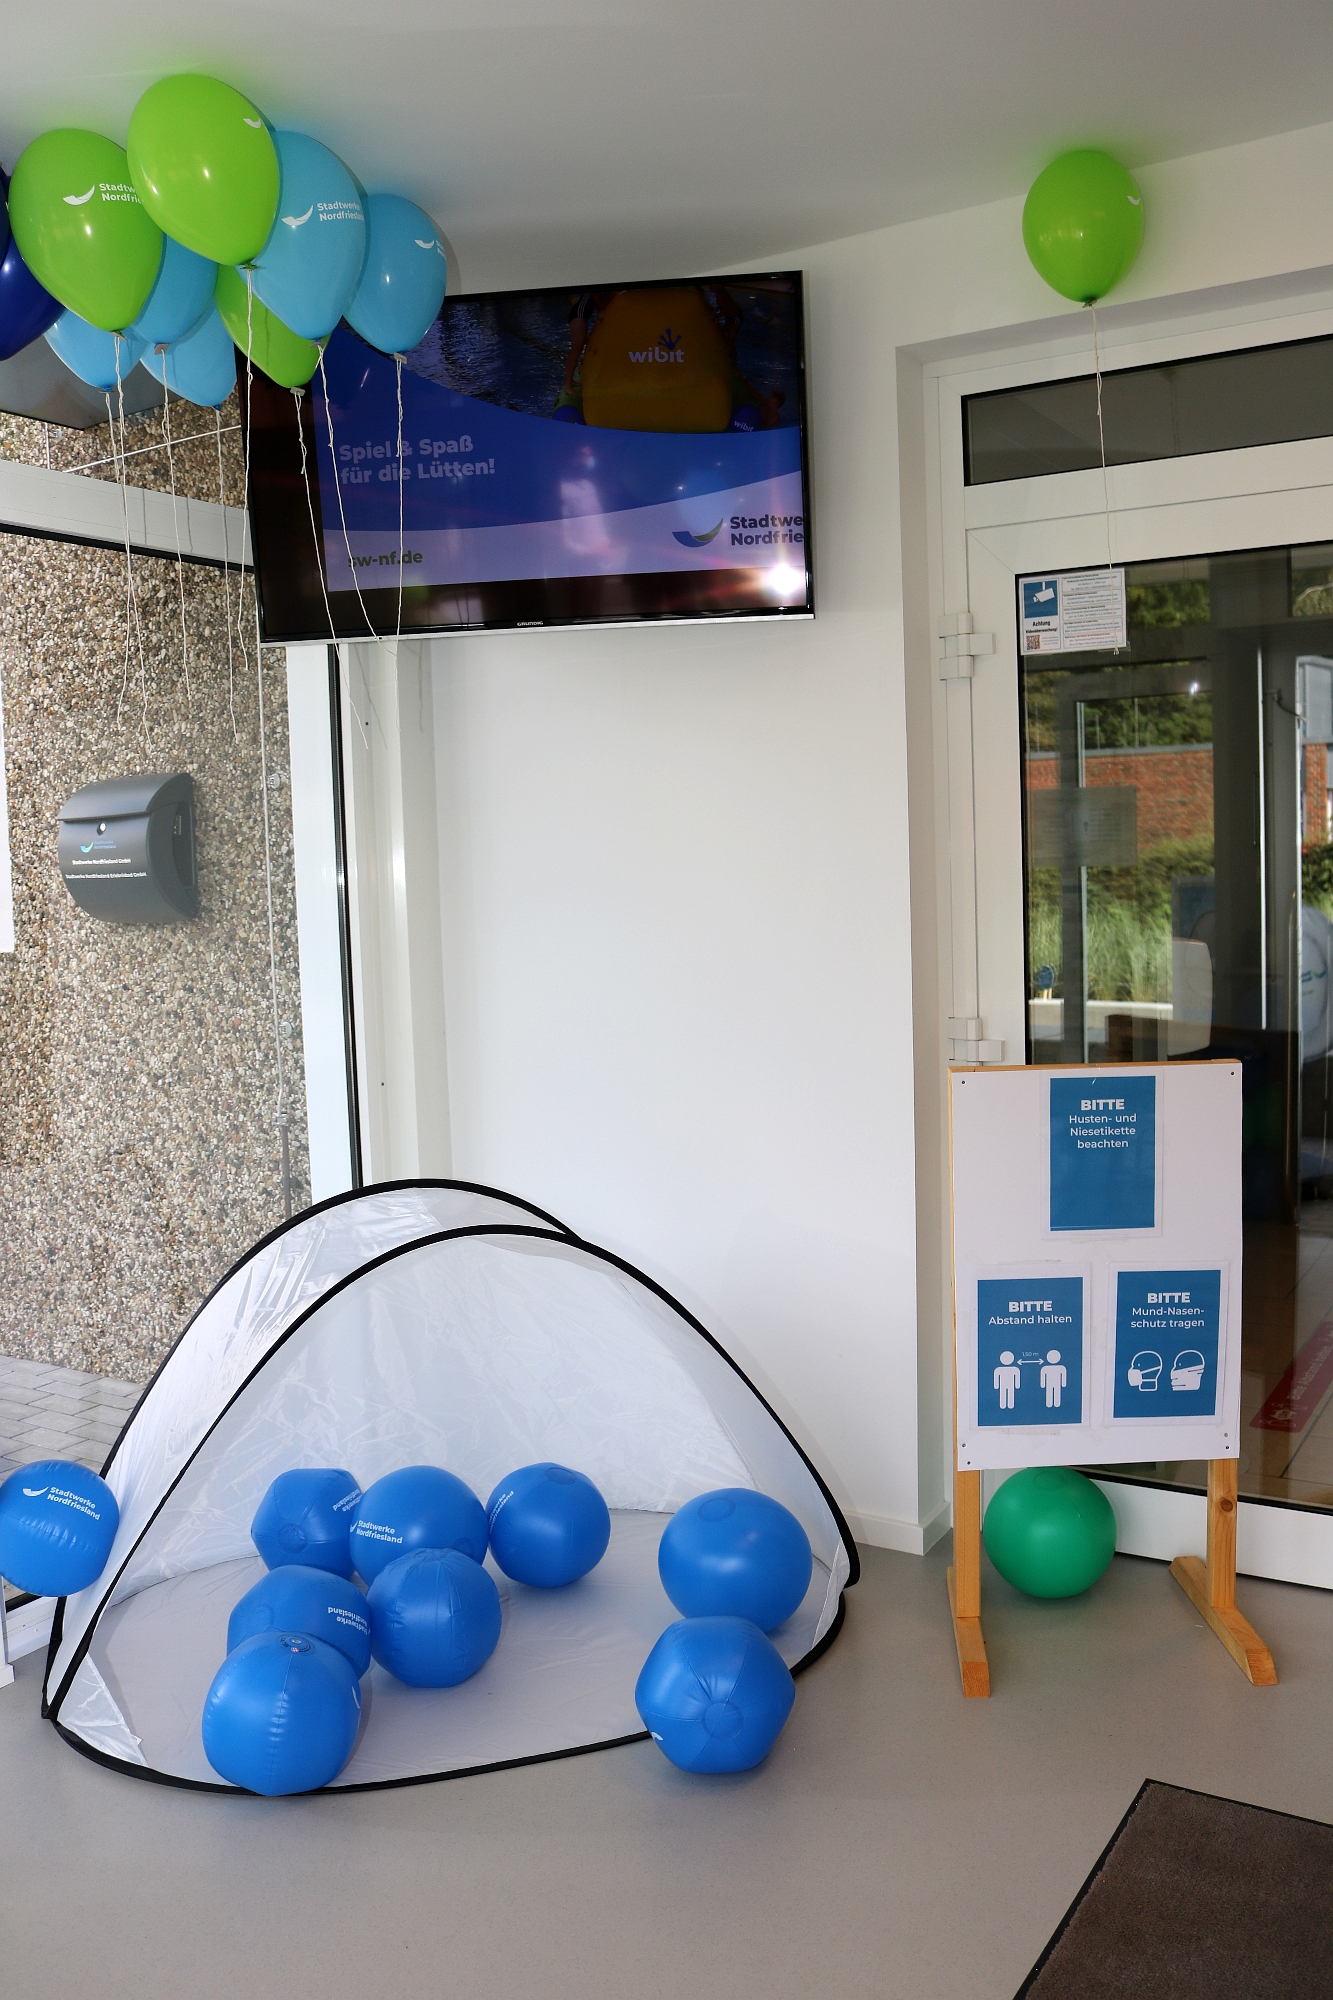 202009 Eröffnung Kundenbüro SWNF 9